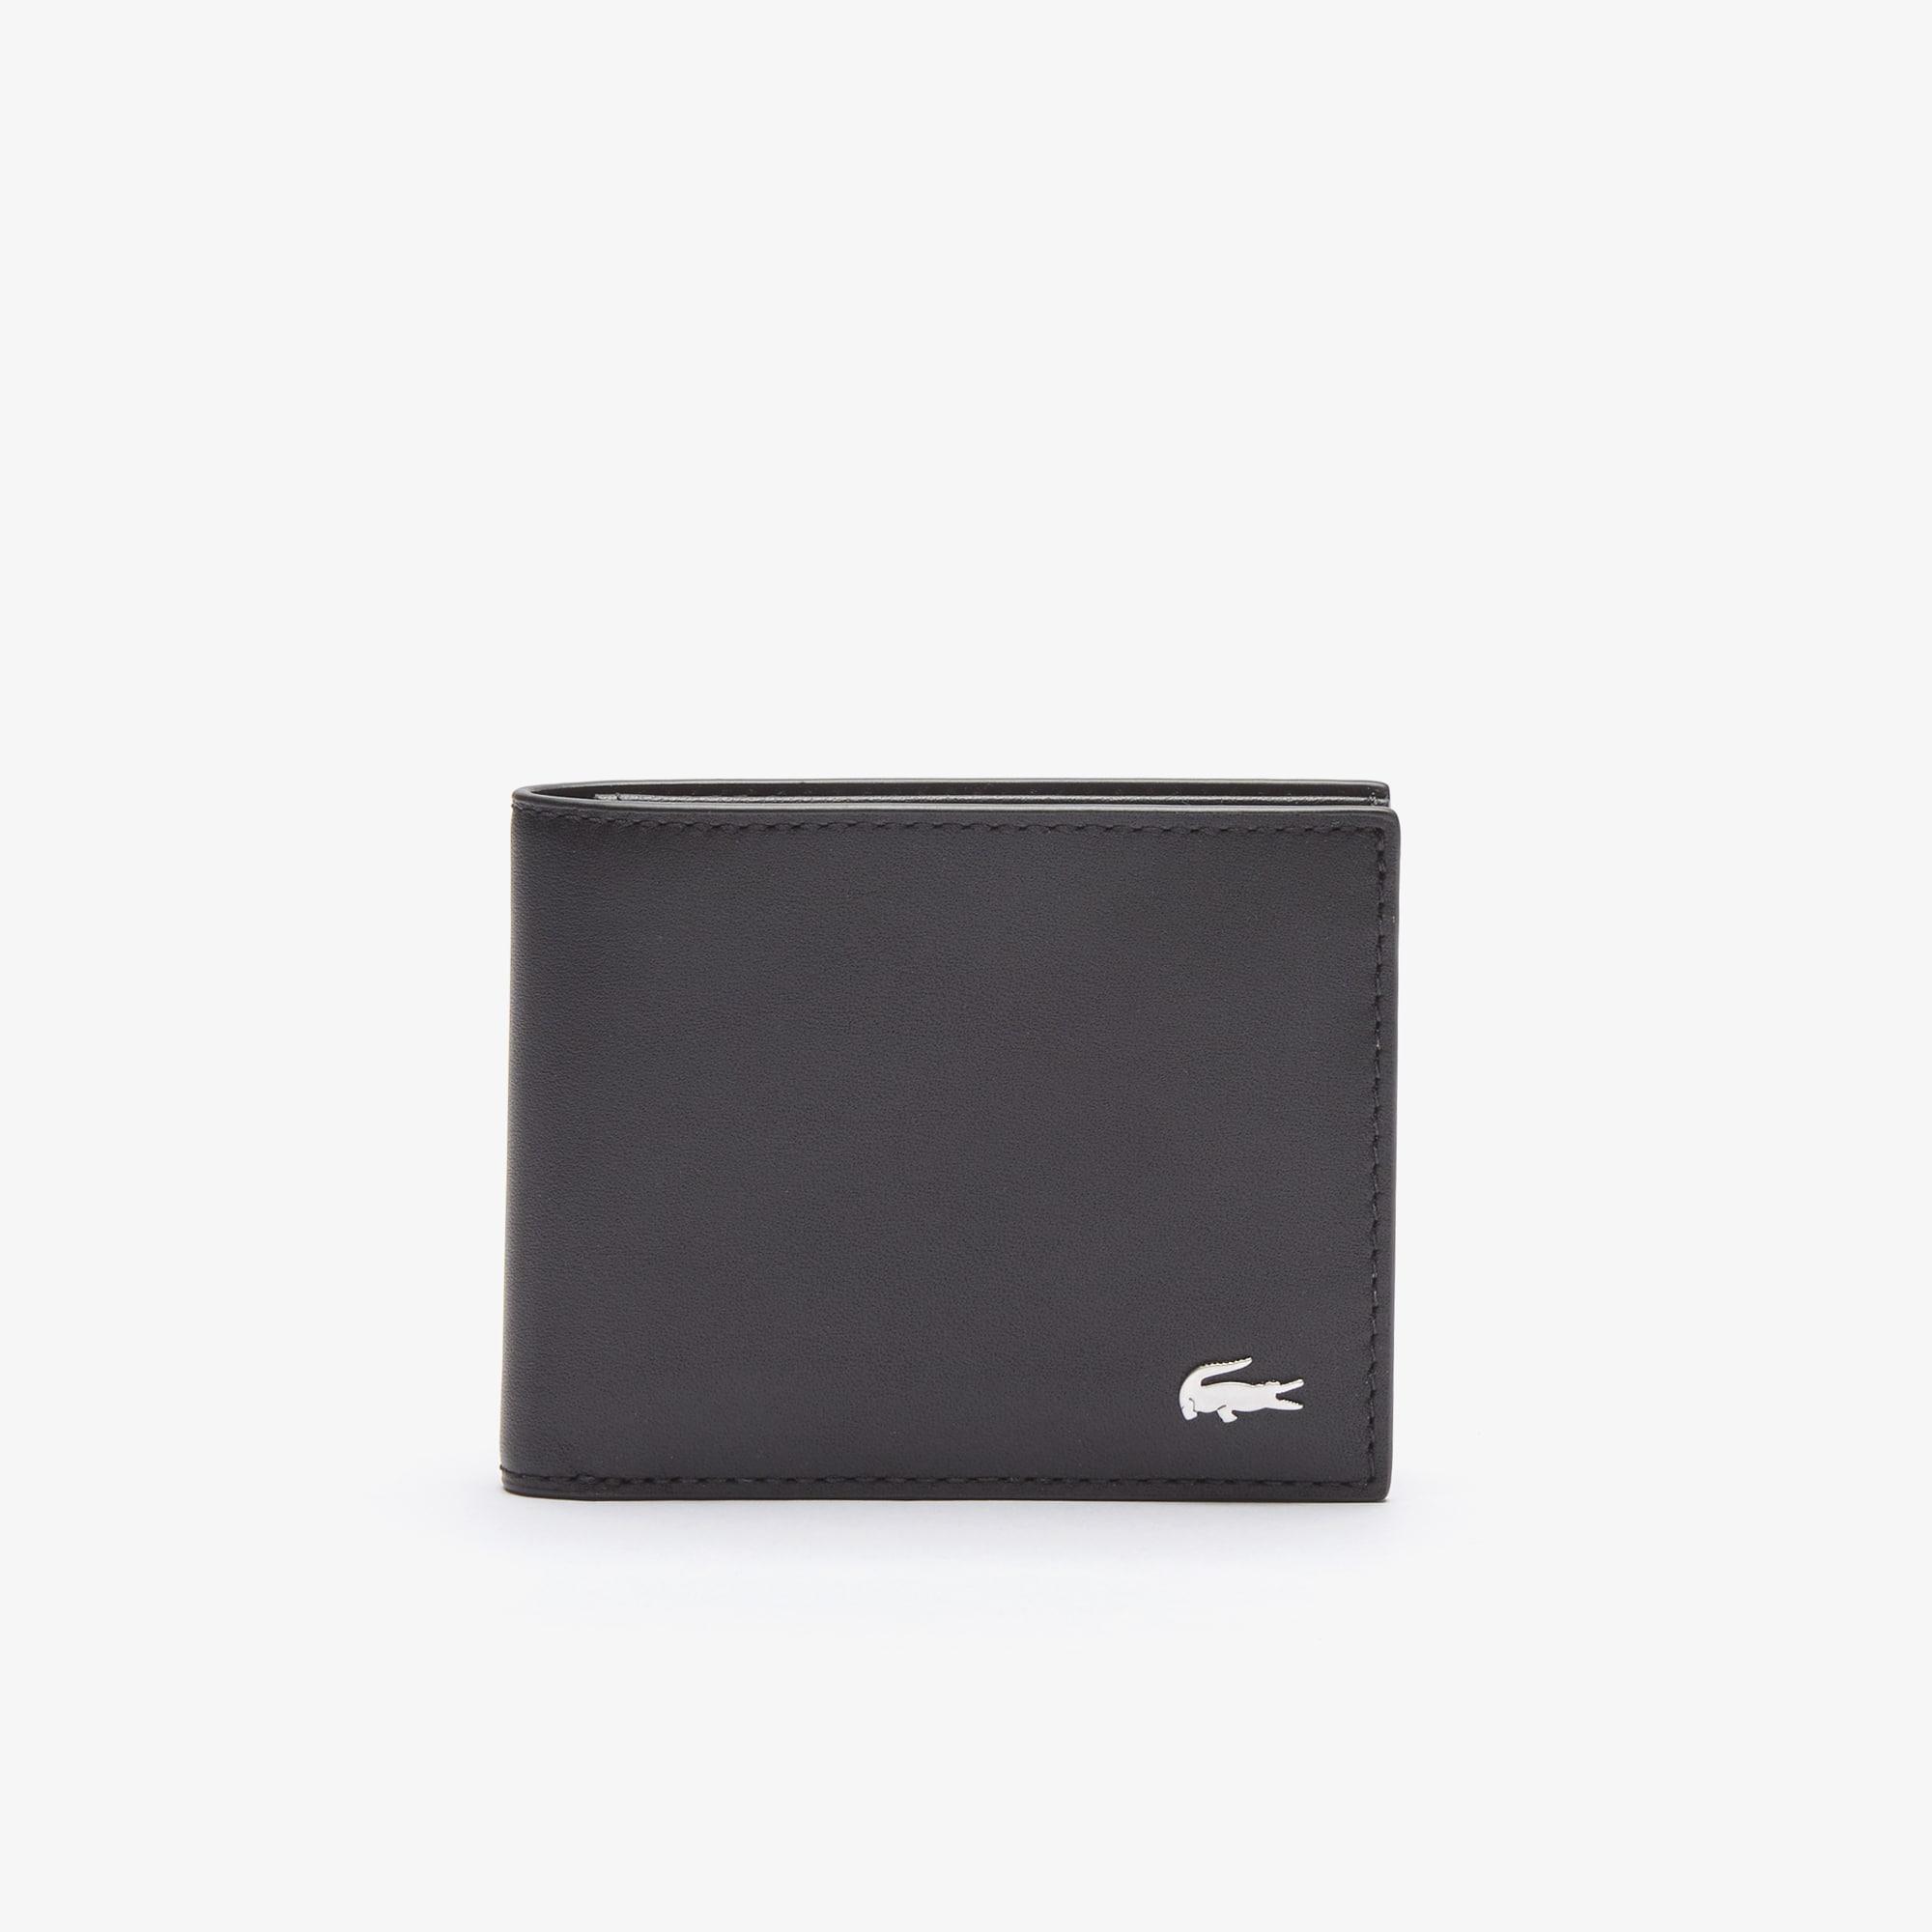 f9fa64de0f3 Wallets | Men's Leather Goods | LACOSTE